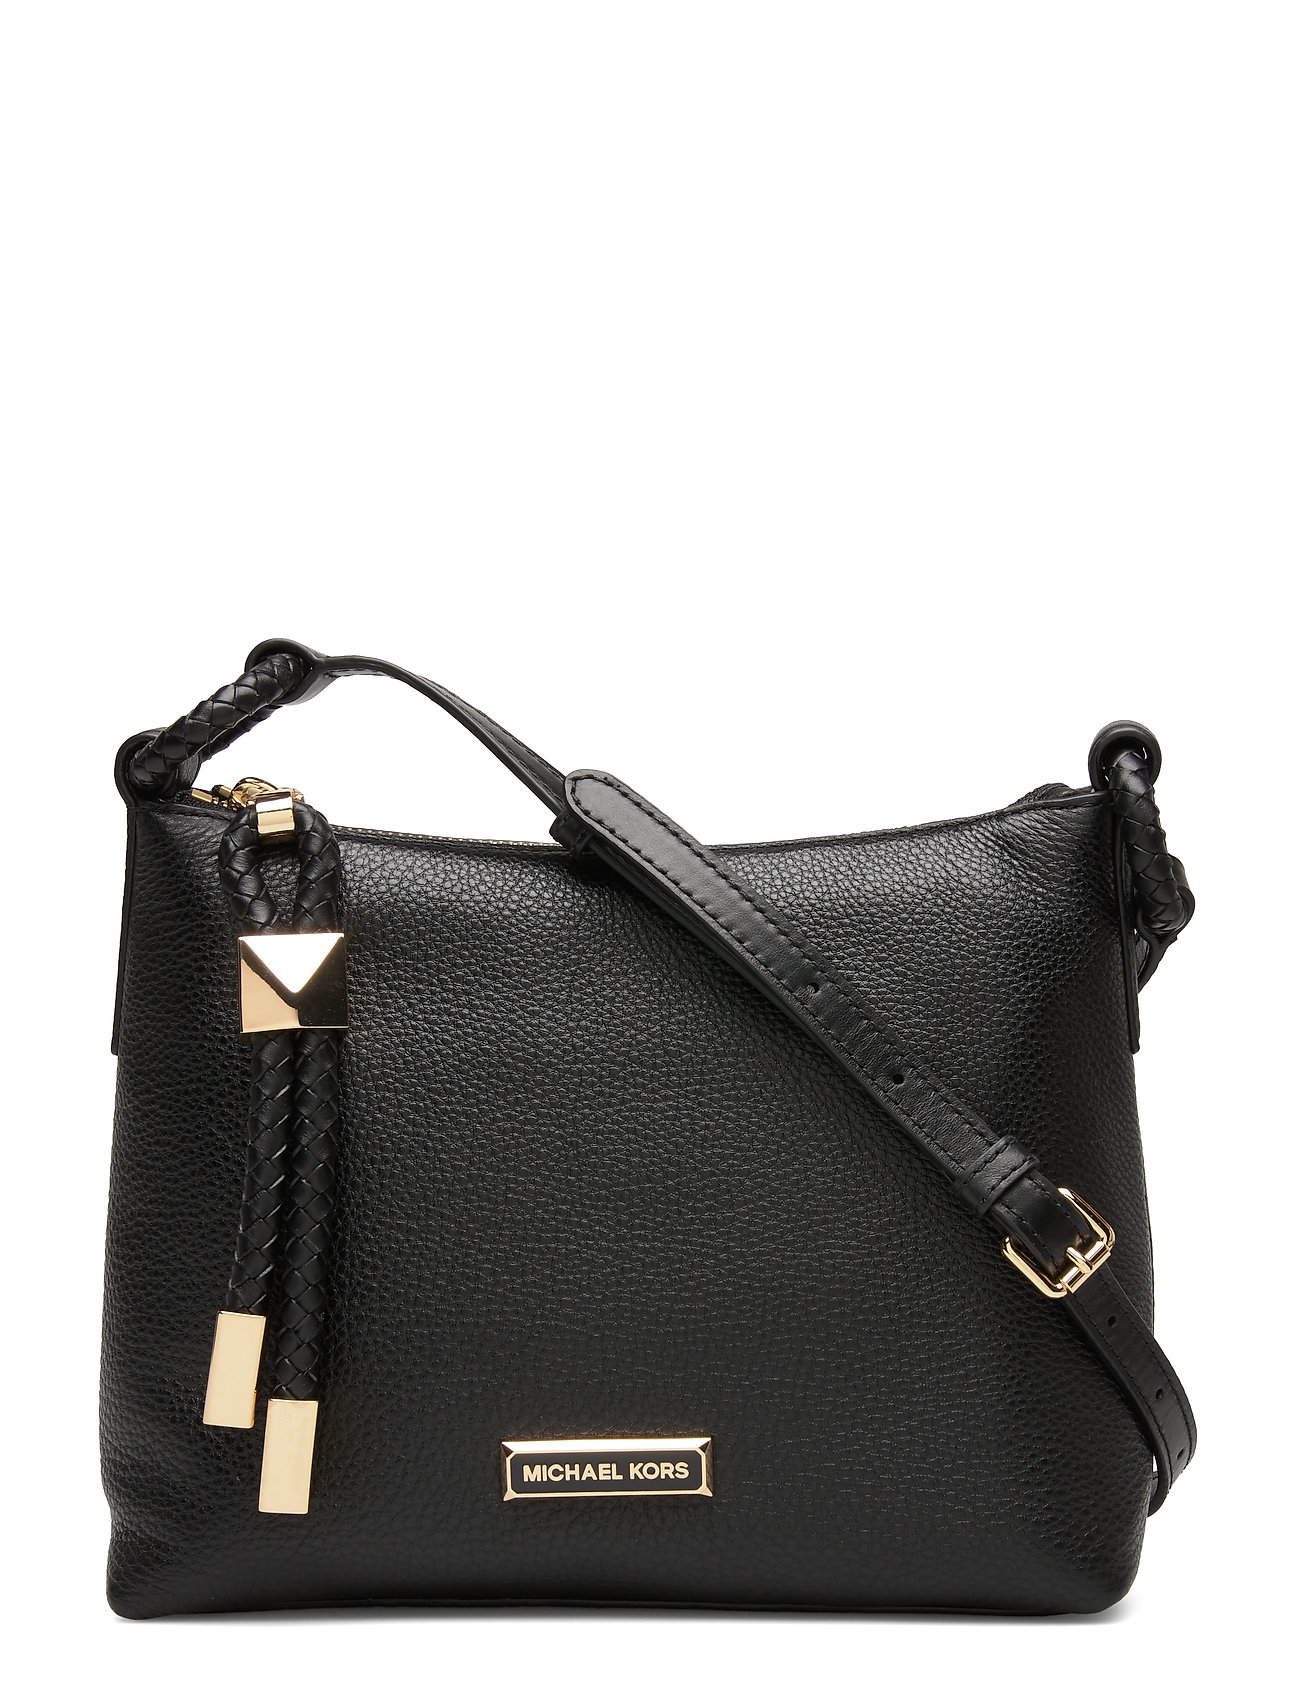 Michael Kors Bags LG CROSSBODY - BLACK